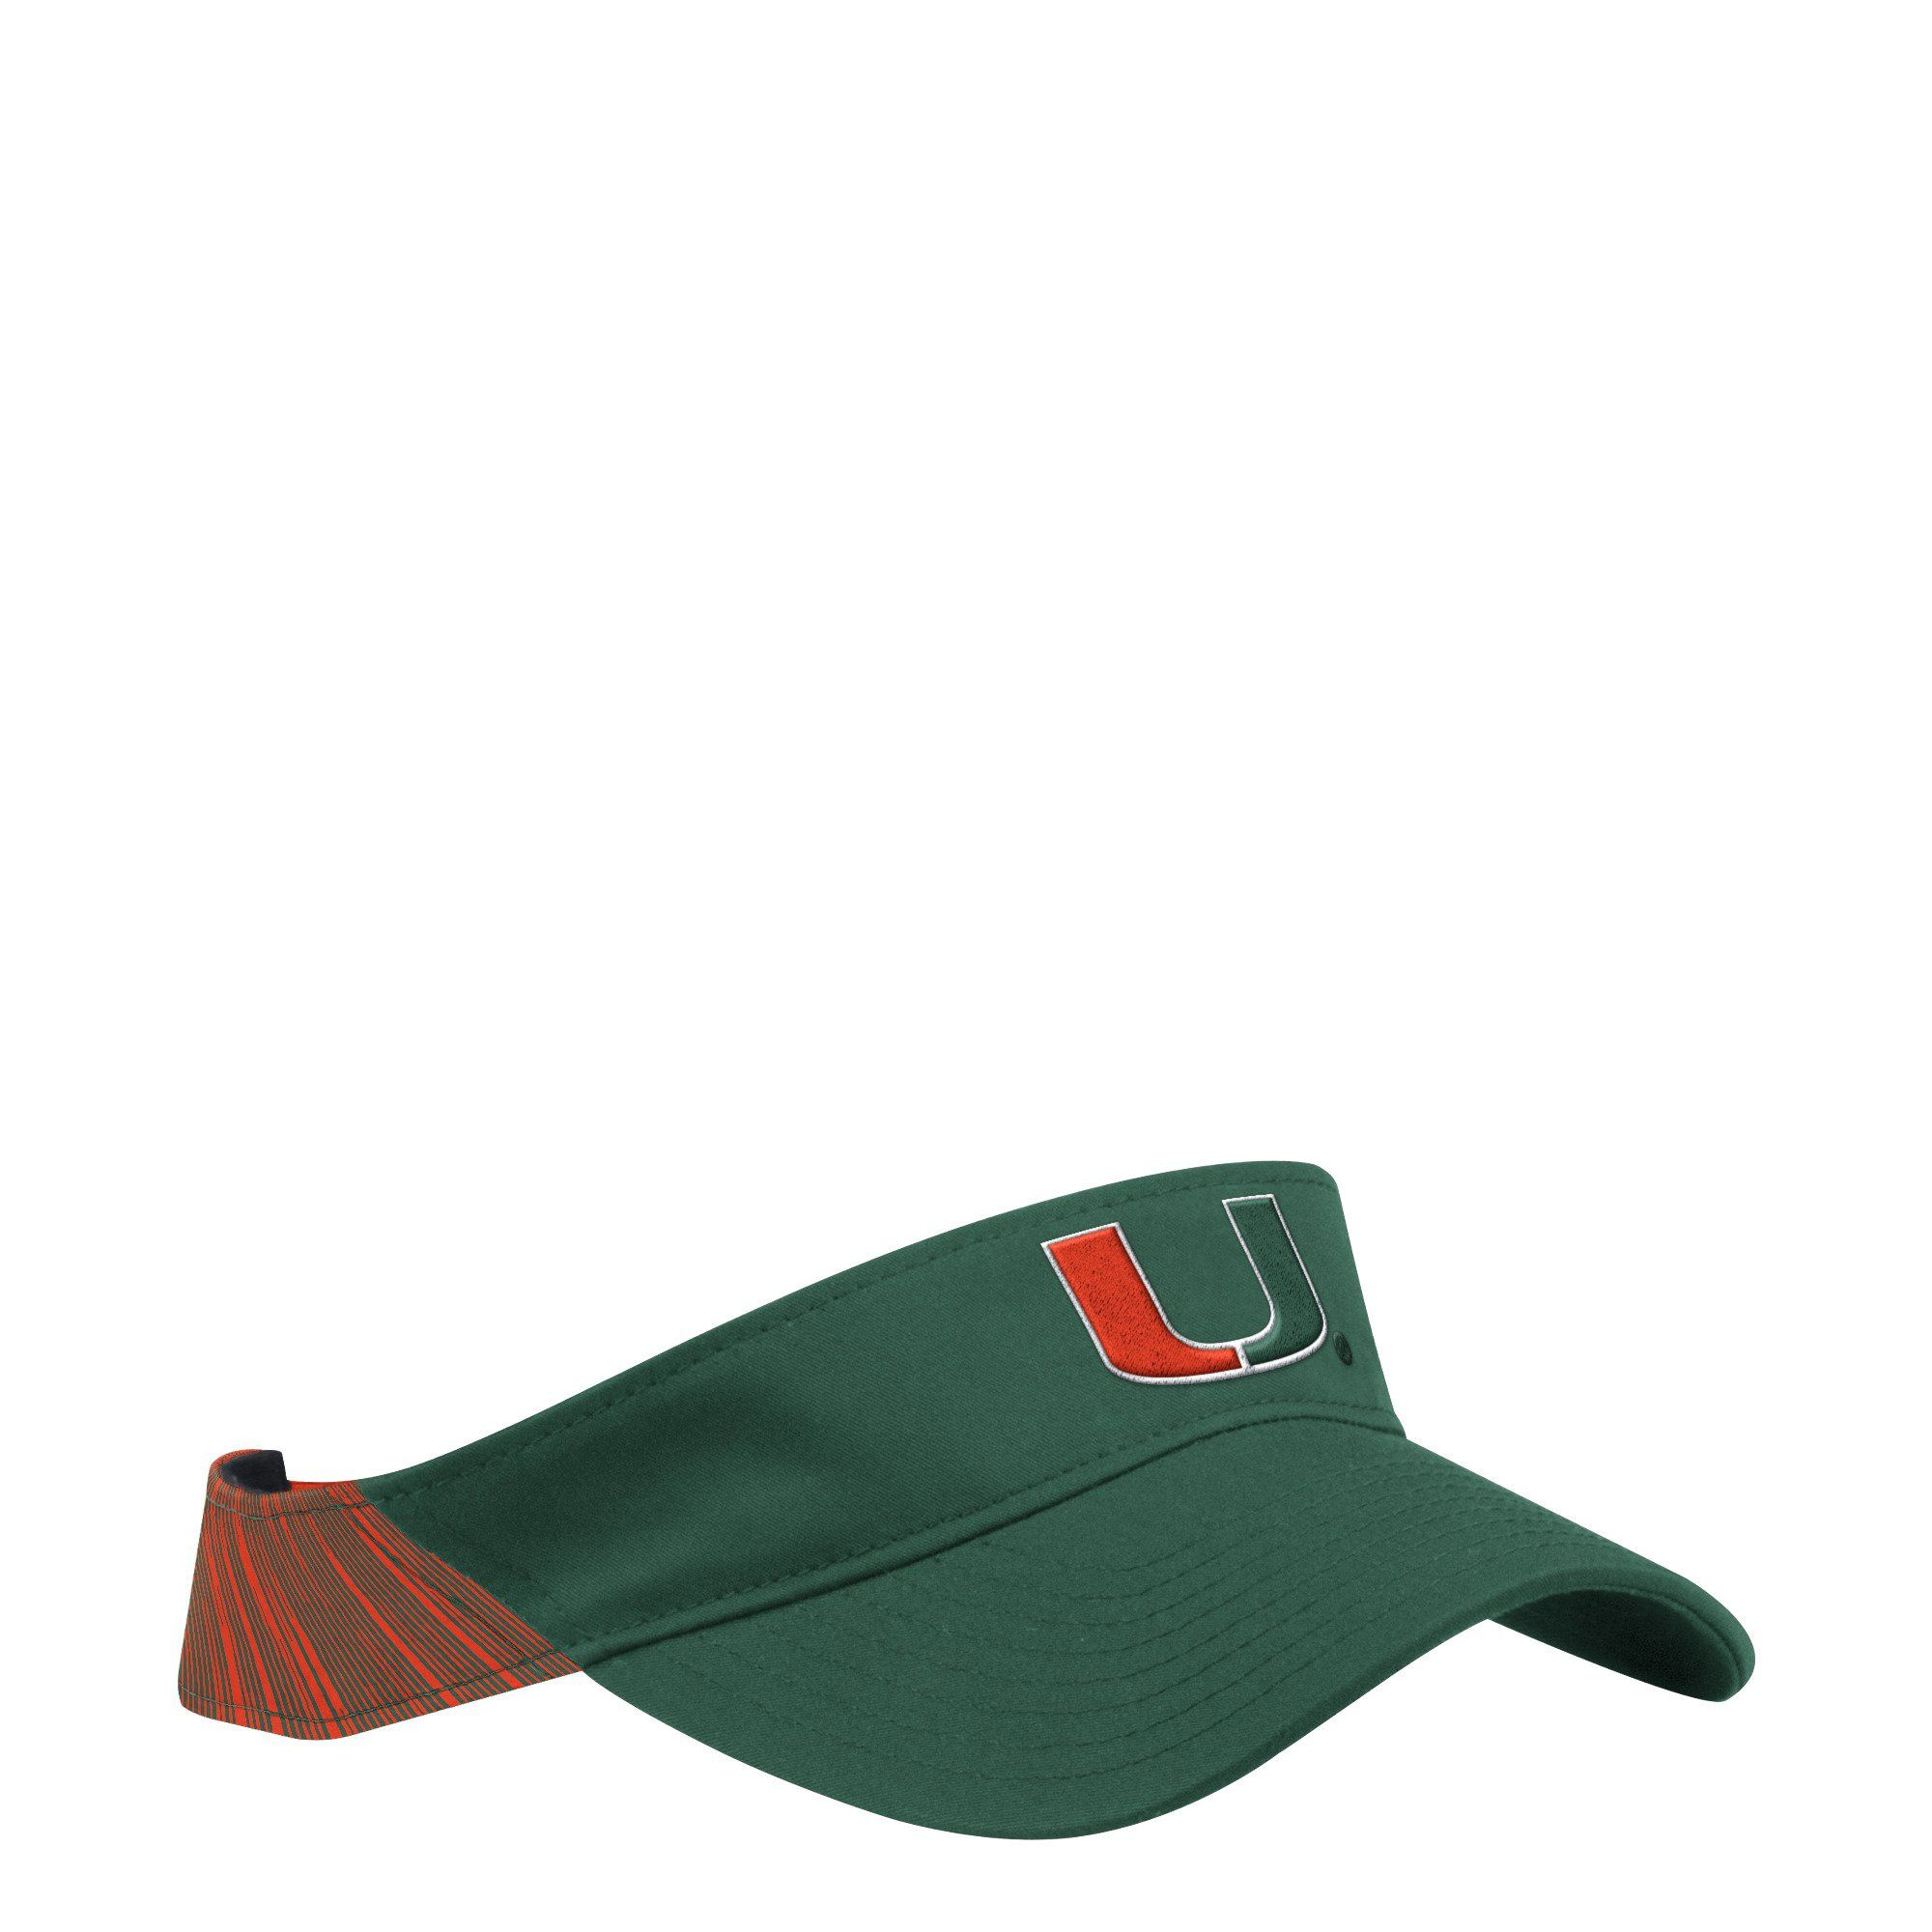 promo code 07a1f 12be3 Miami Hurricanes adidas 2018 Coaches U Adjustable Visor - Green Orange